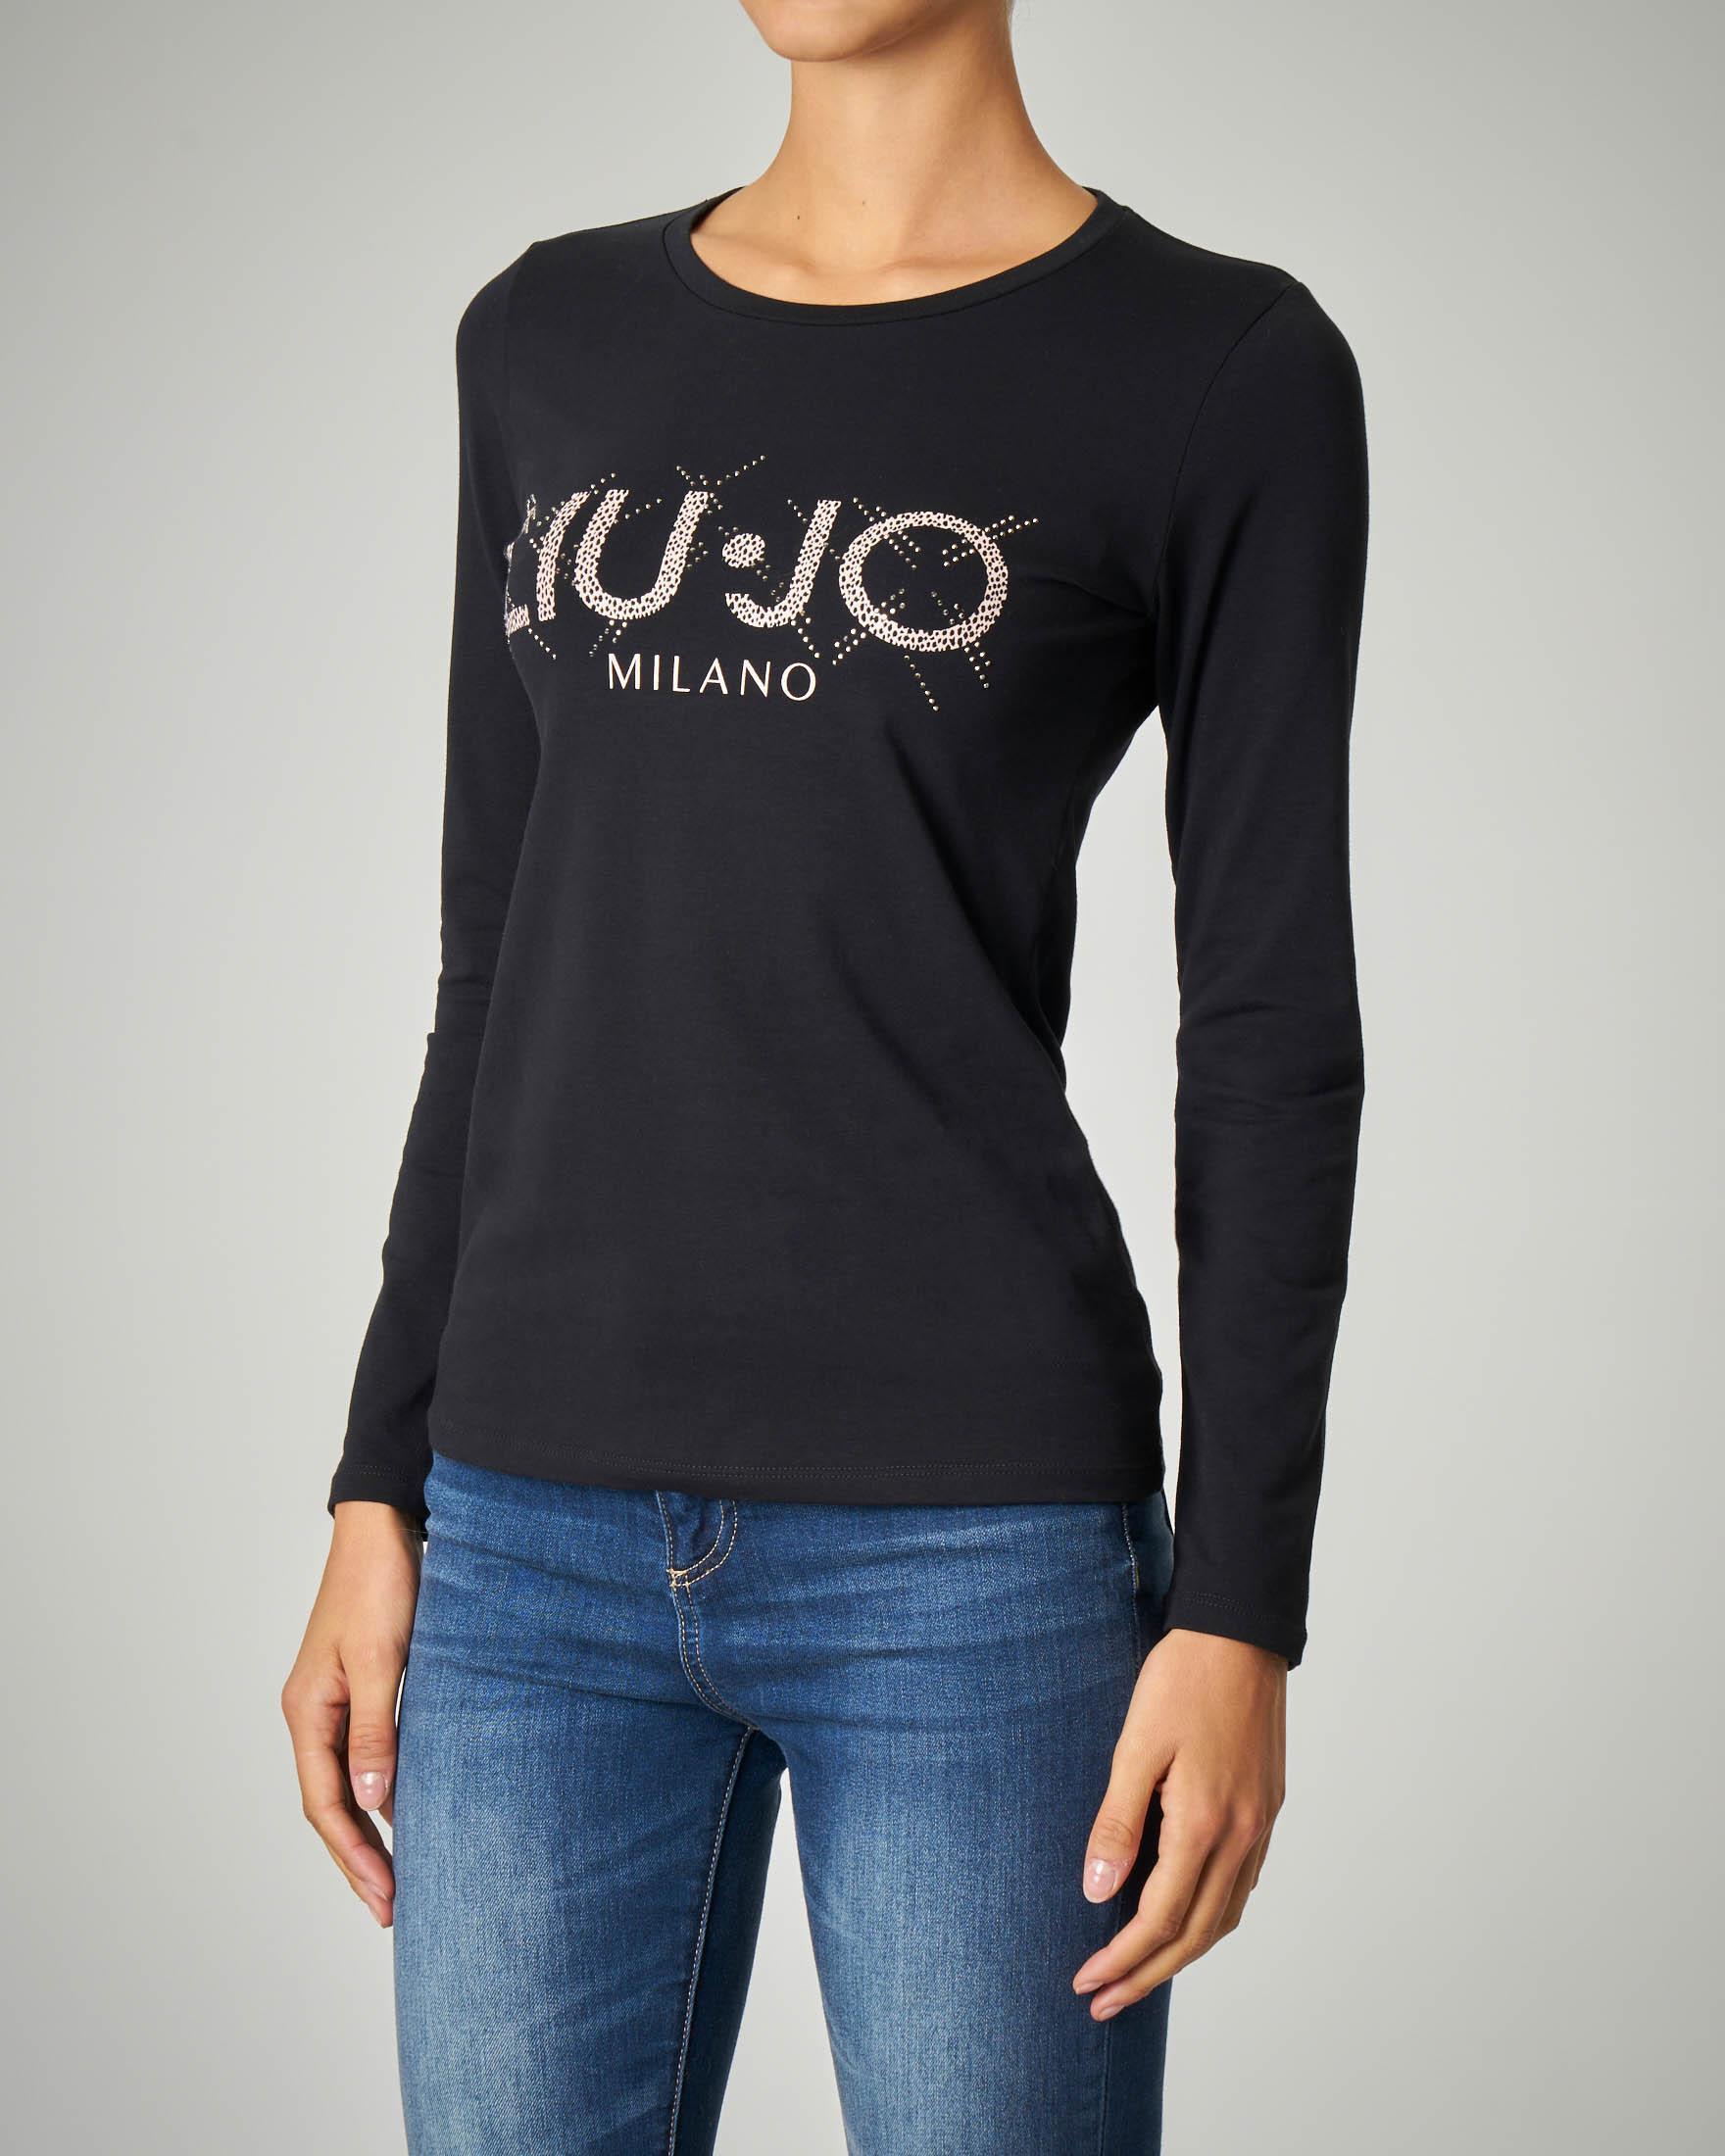 T-shirt nera manica lunga con logo